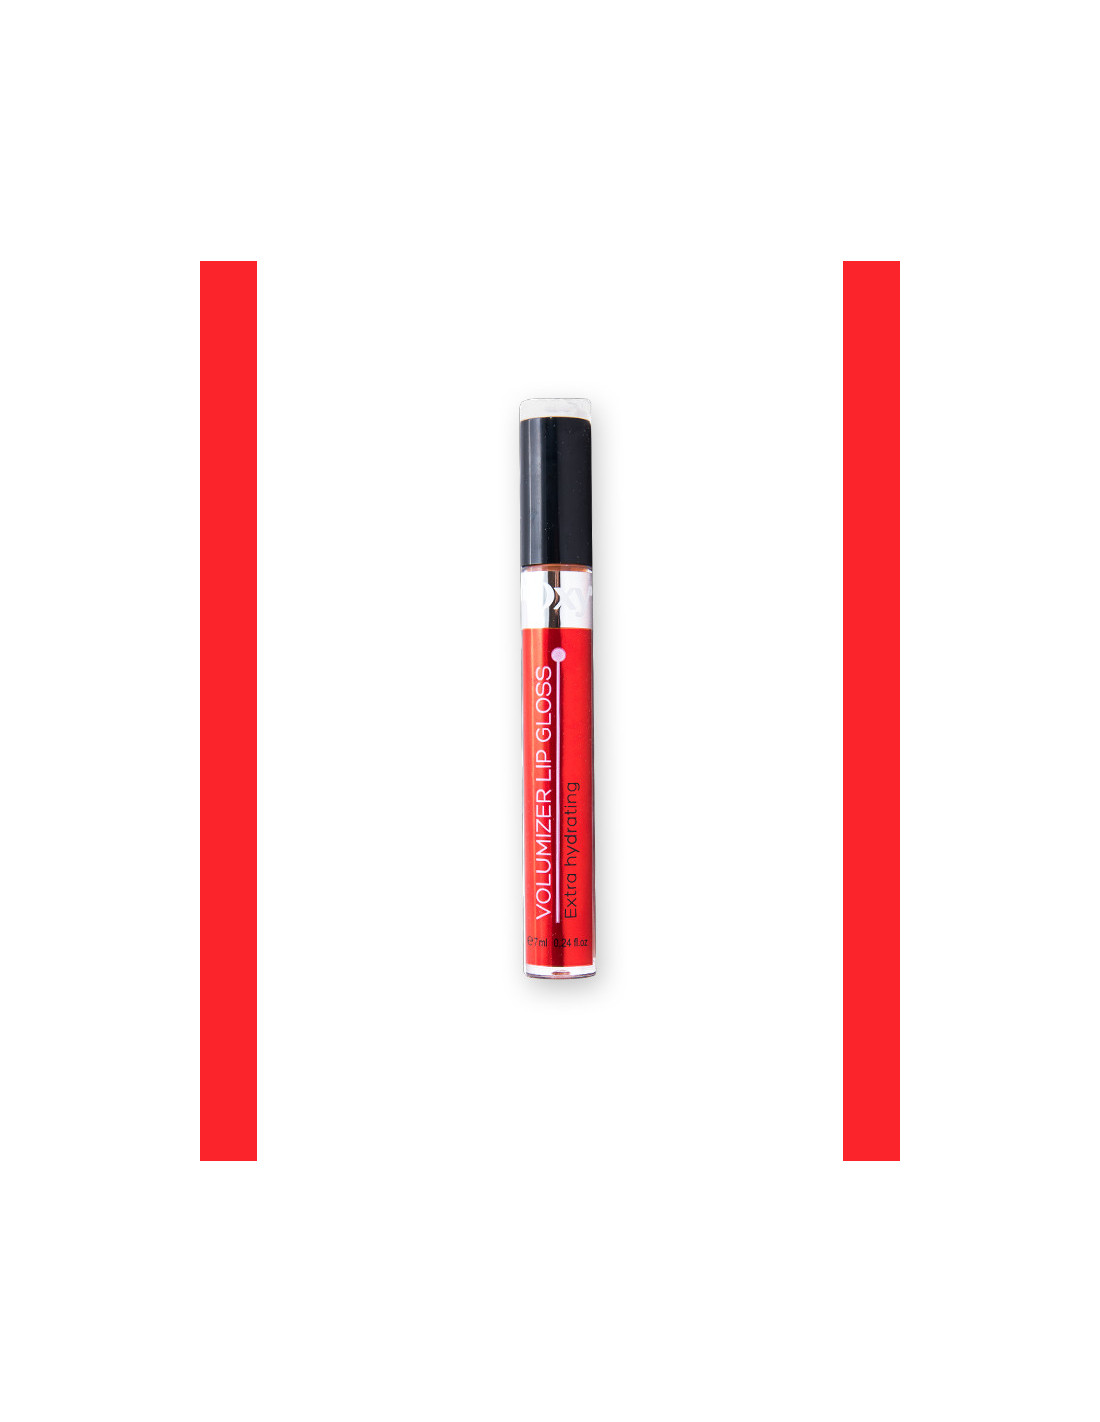 Beoxy Volumizer Lip Gloss Extra Hydrating